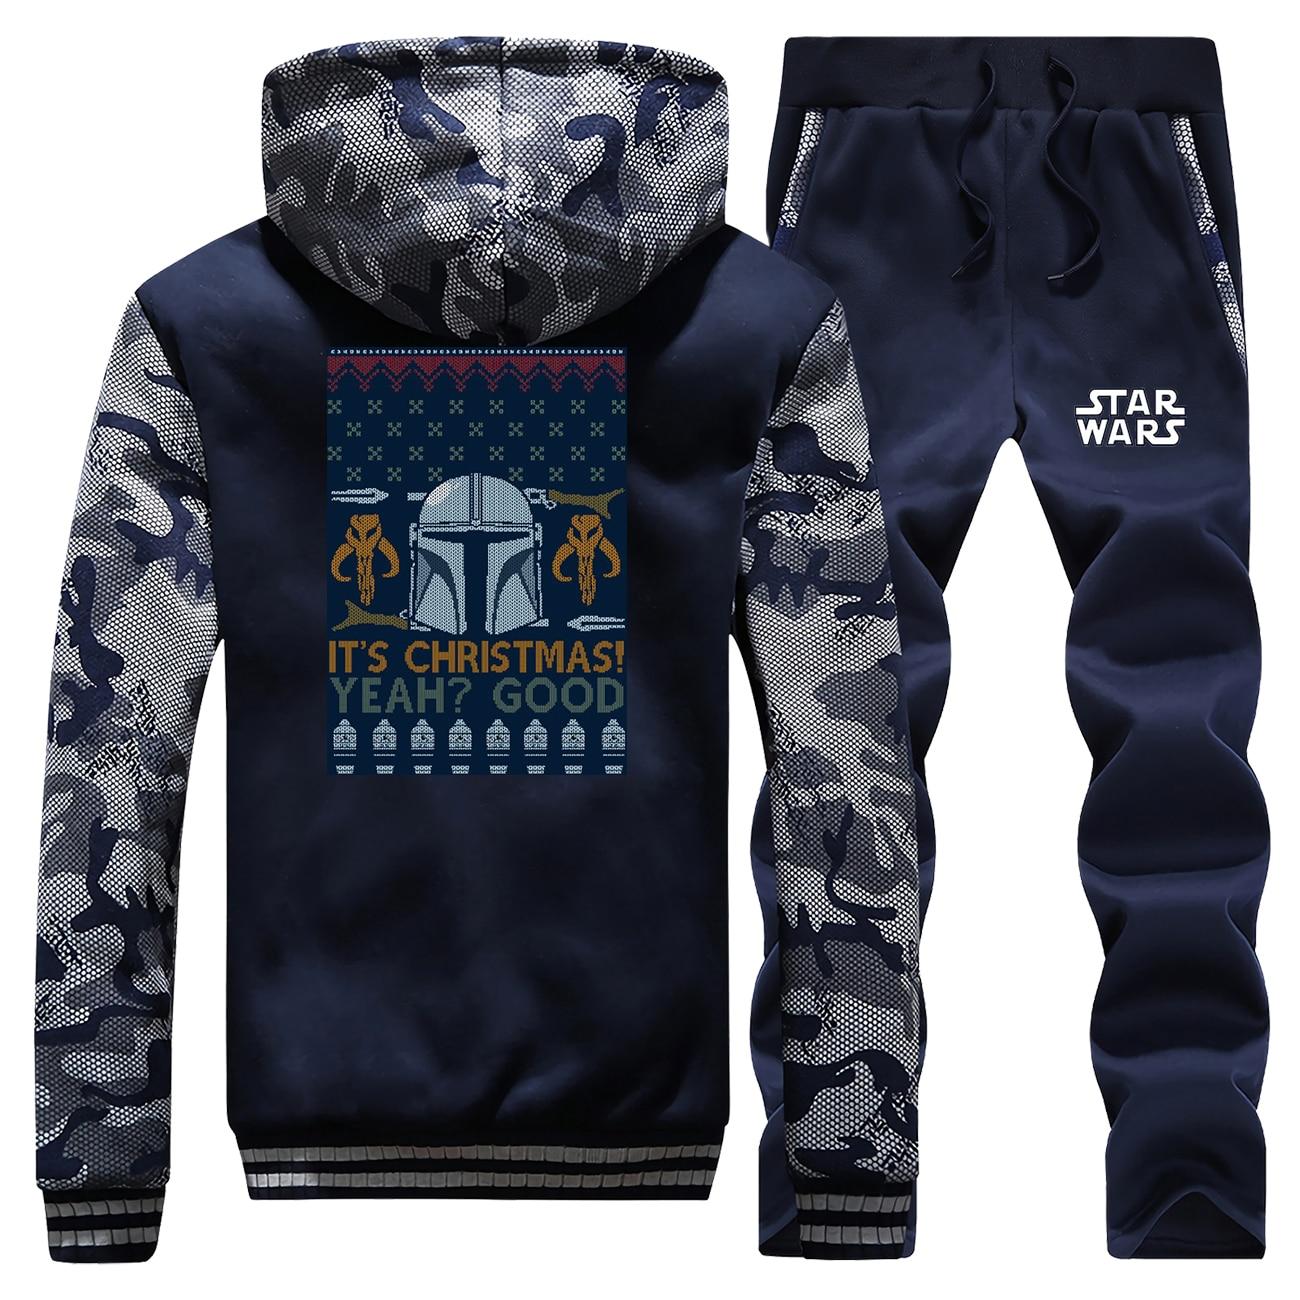 Mandalorian Winter Camo Pans Sets Jacket Baby Yoda Men Fleece Thick Warm Jackets And Coats Hoodies Star Wars Pants Sets Hoody